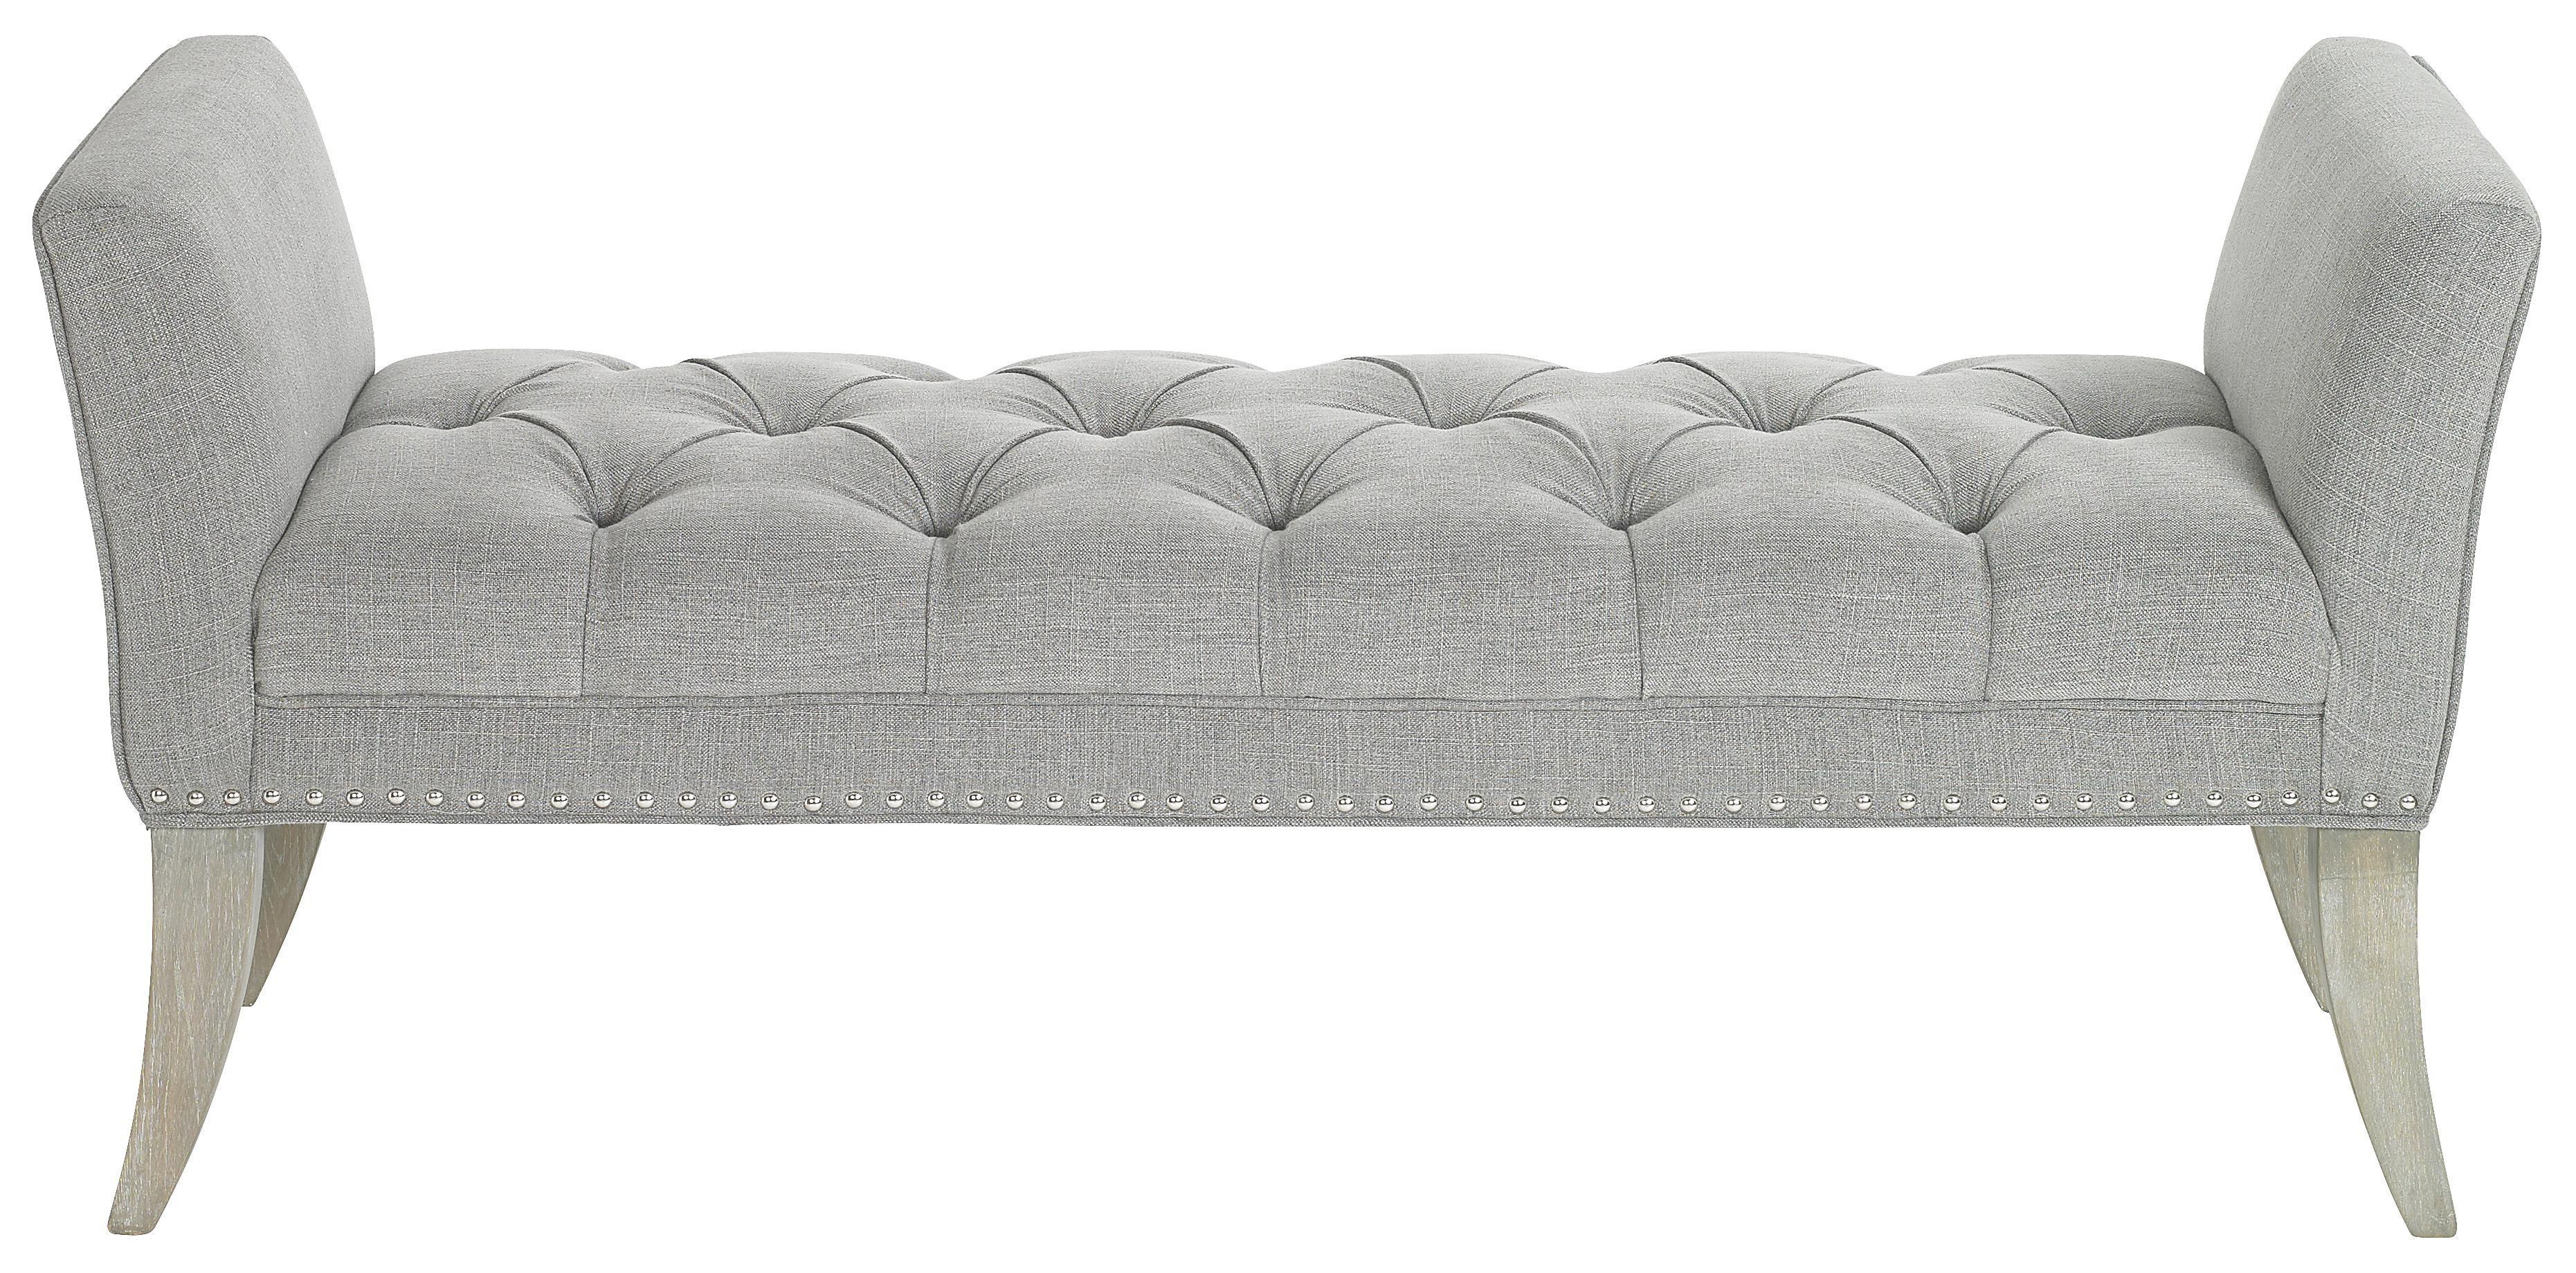 SITTBÄNK - grå, Trend, trä/textil (143/64/47cm) - Ambia Home